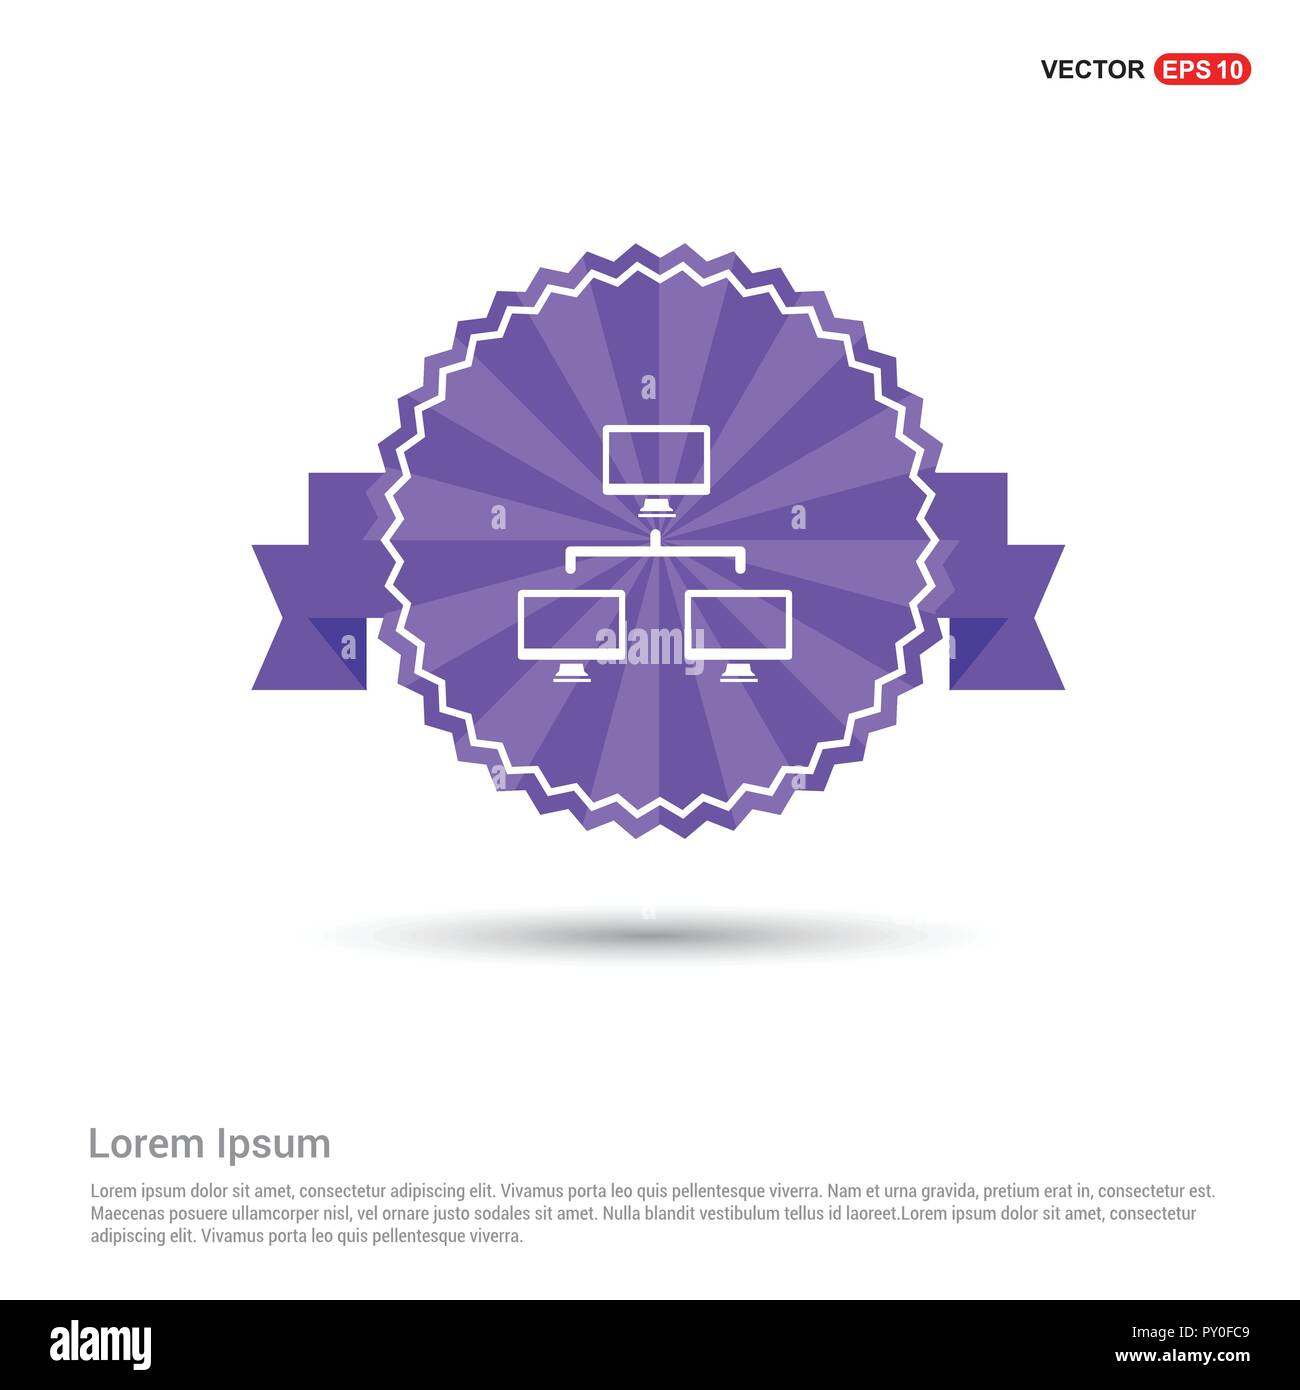 business organogram download free vector art stock.html